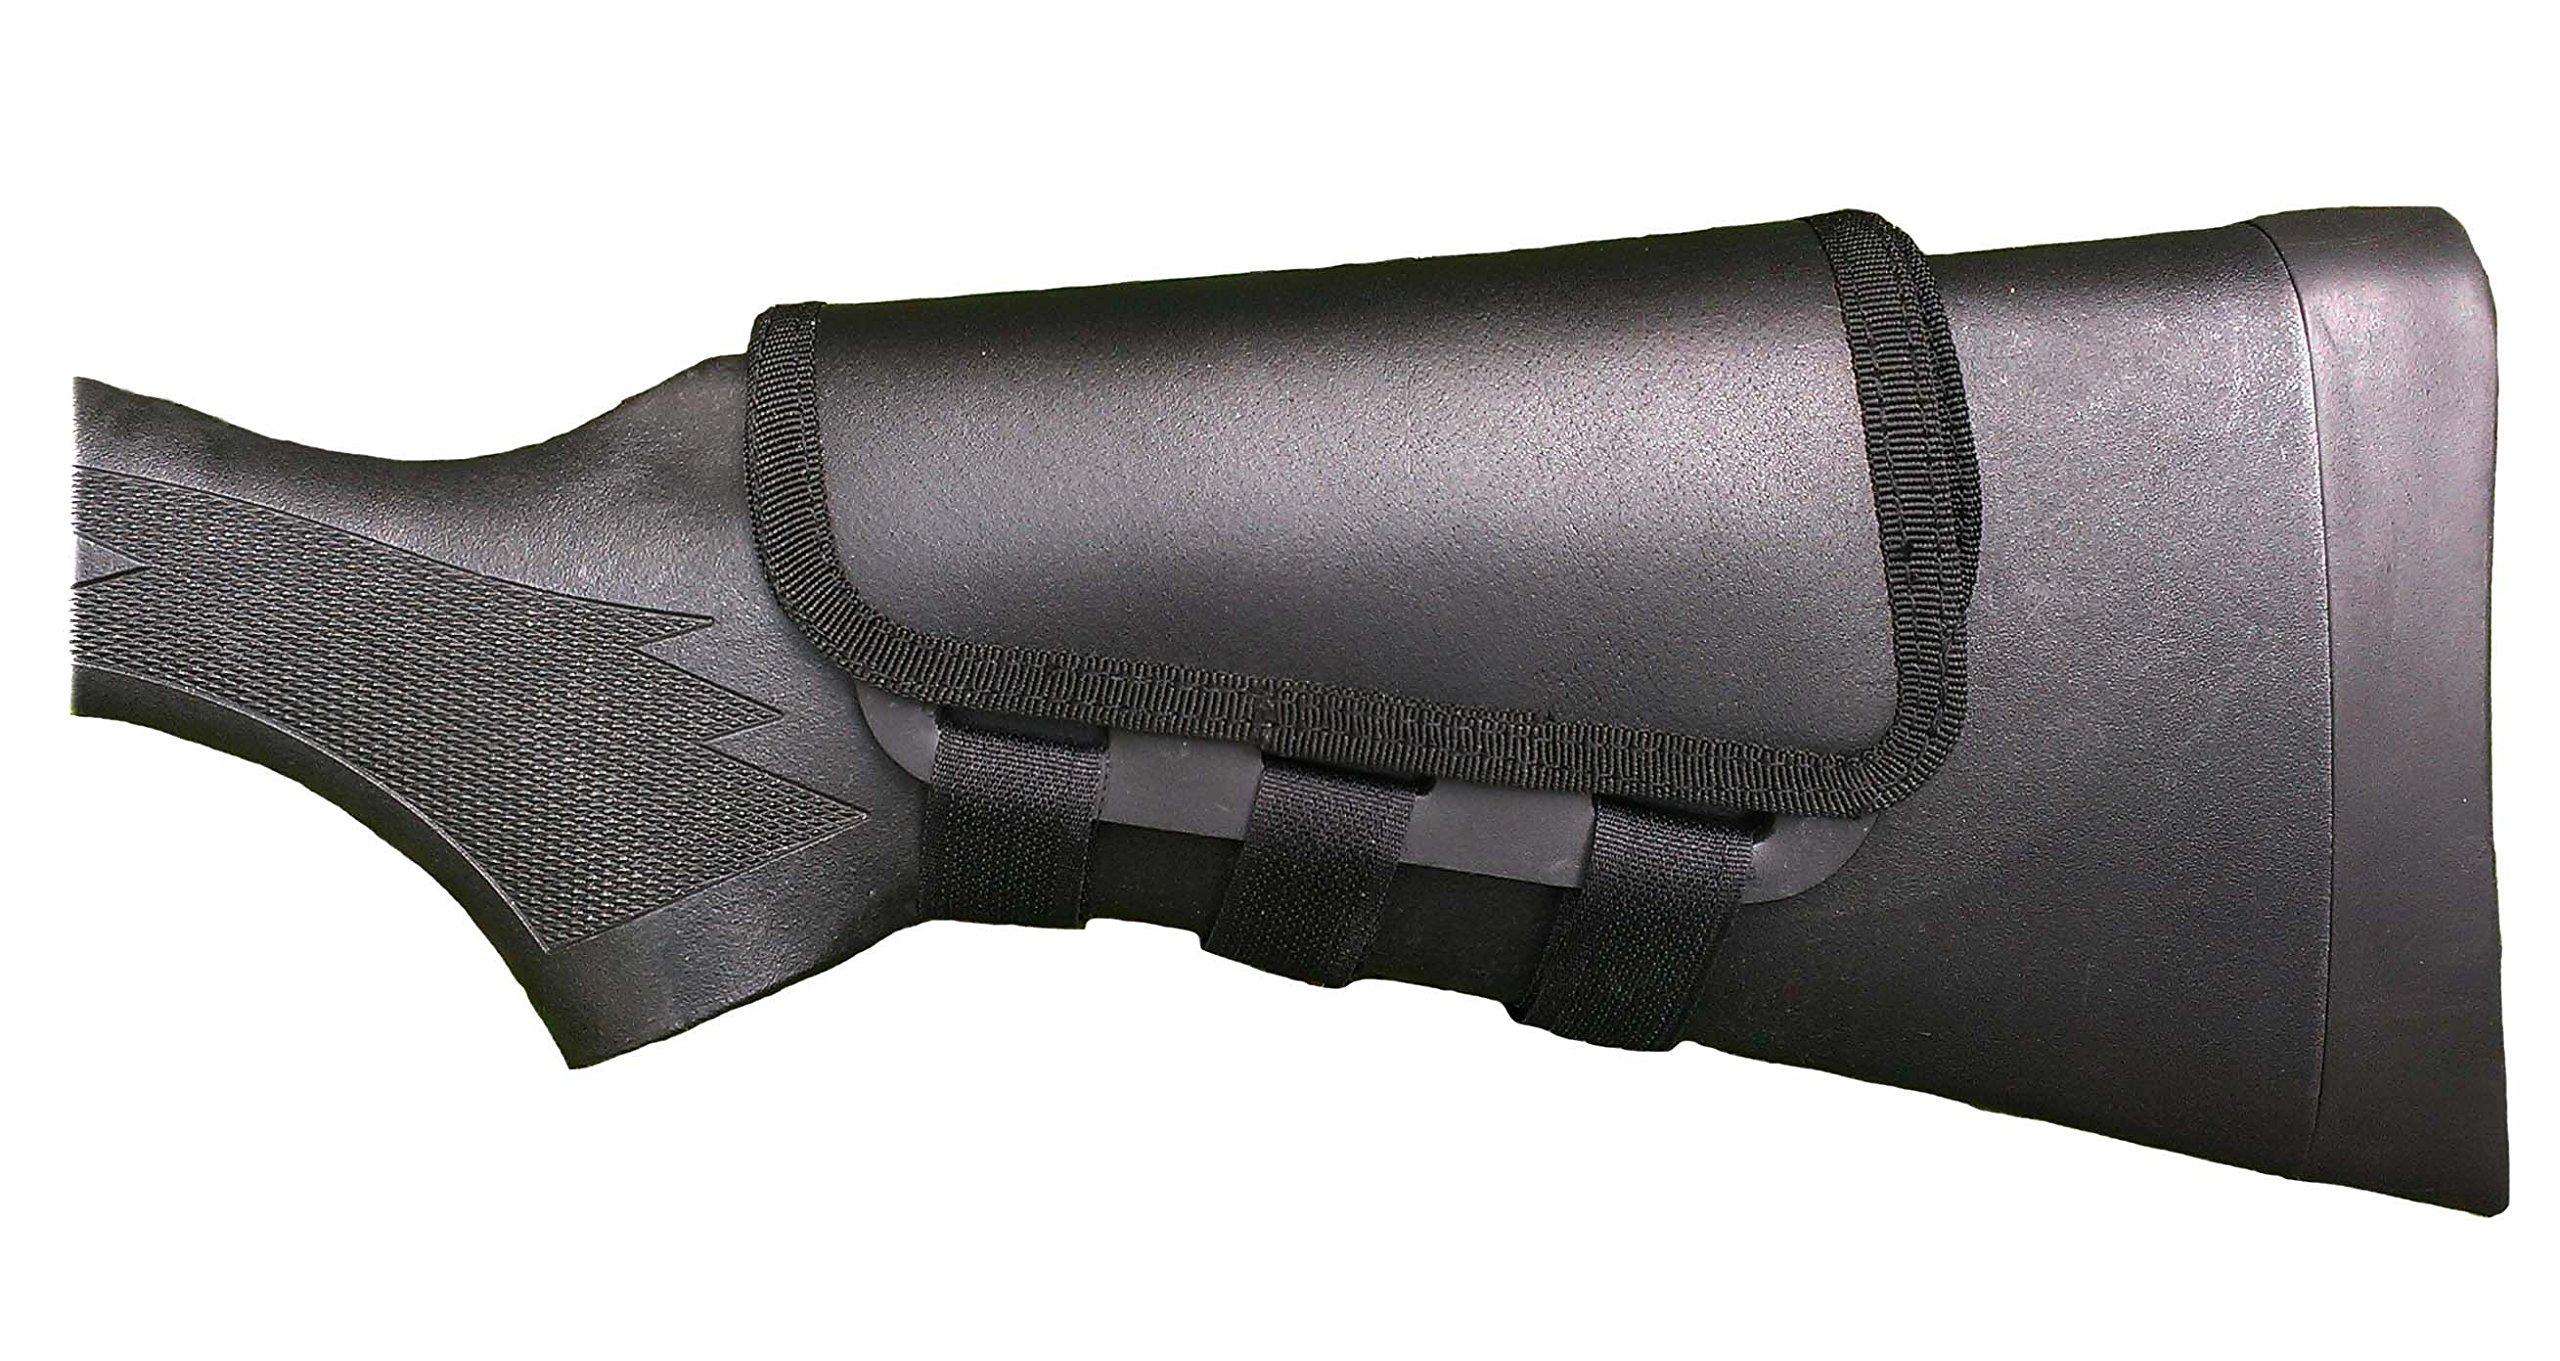 ITC Rifle Cheek Pad/Cheek Riser/CheekRest Marksmanship/Top Grain Black Leather by ITC